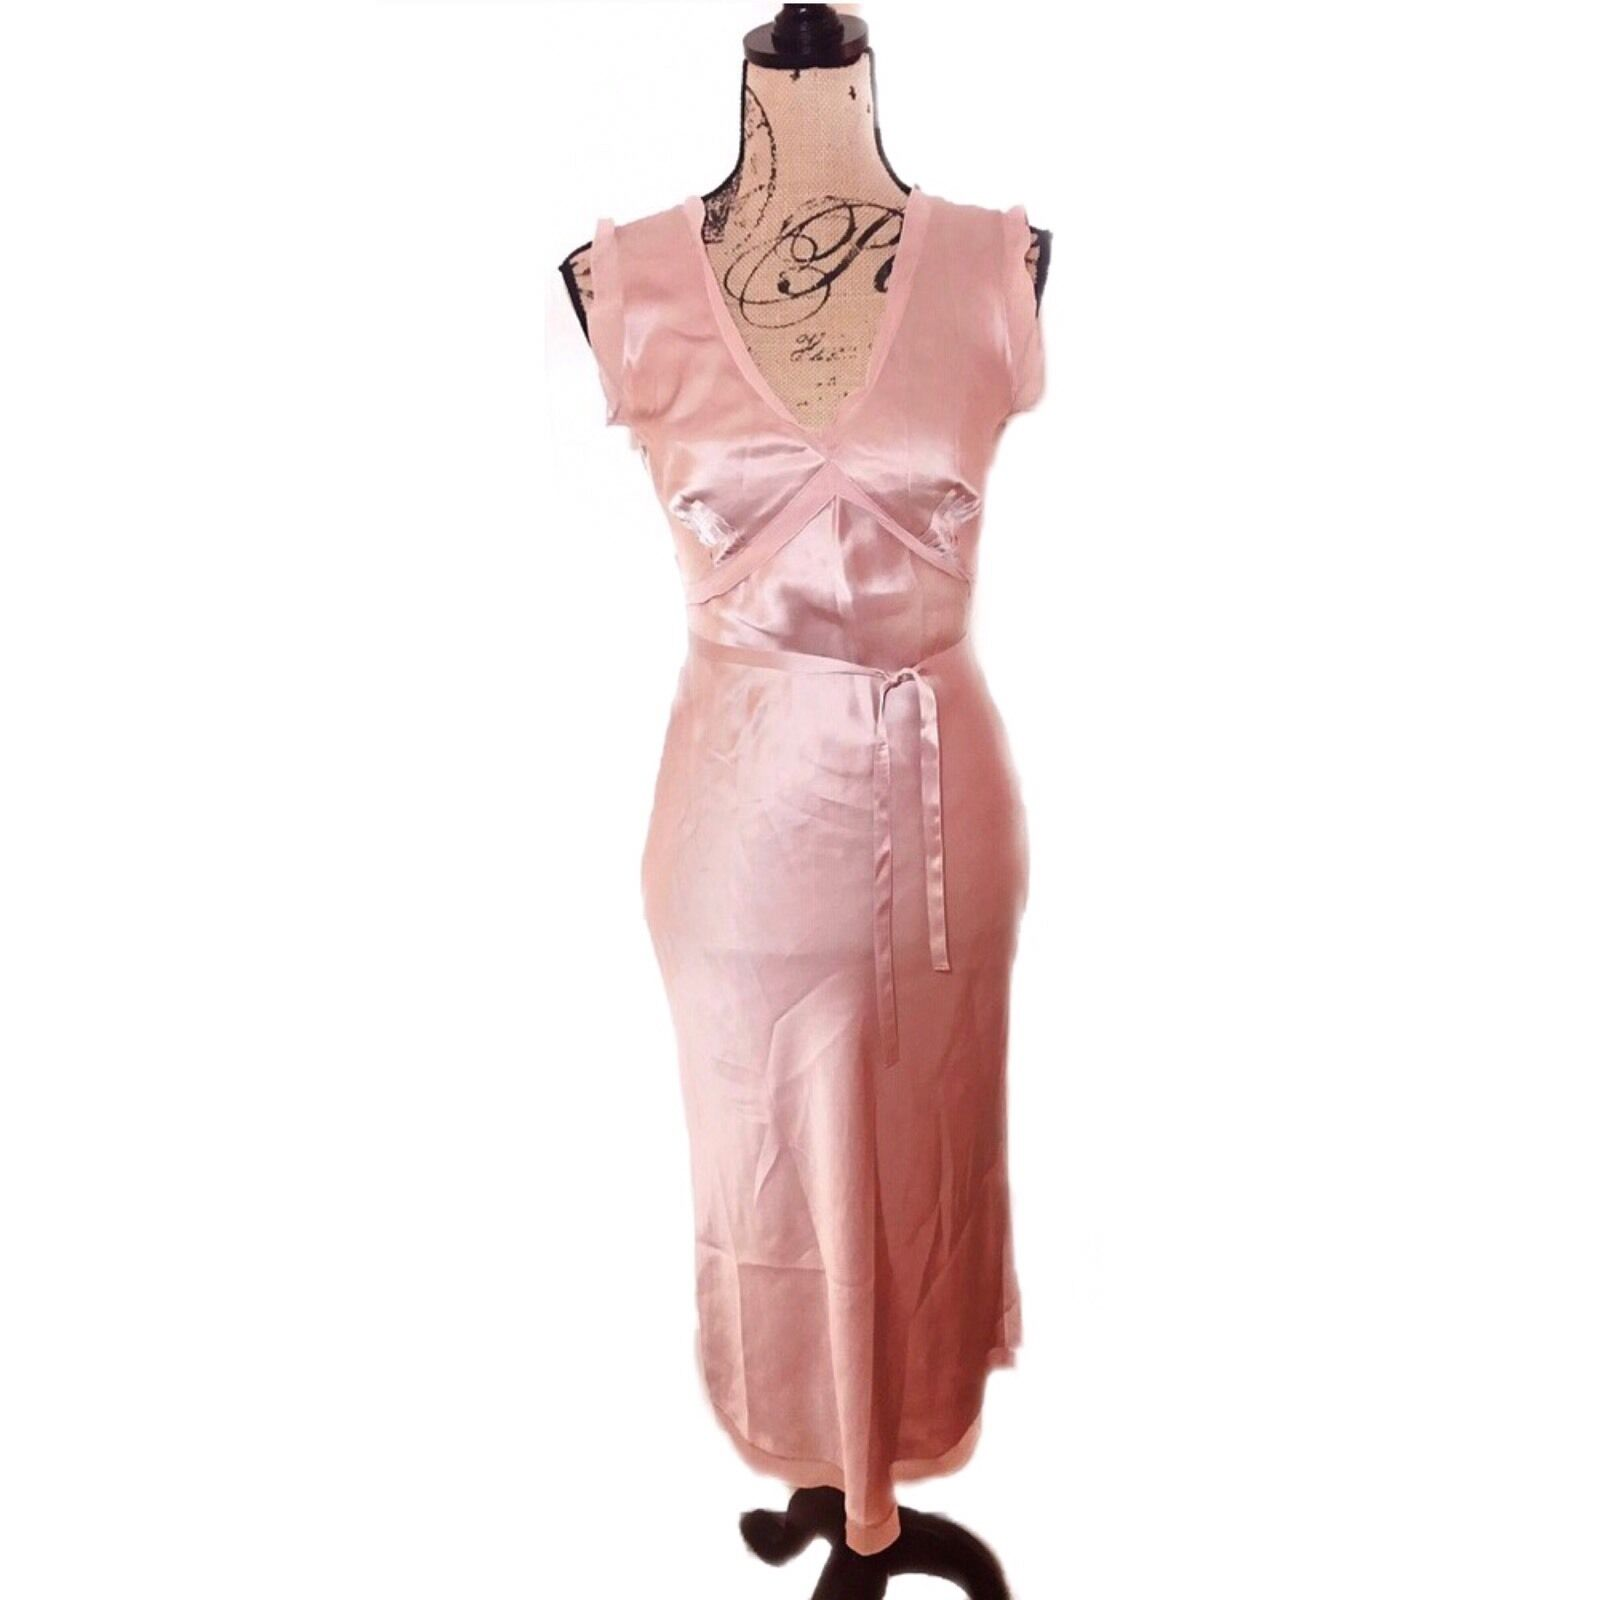 Calypso Calypso Calypso St. Barth Light Pink 100% Silk Tie-Waist Midi Dress Size 2 da4d73